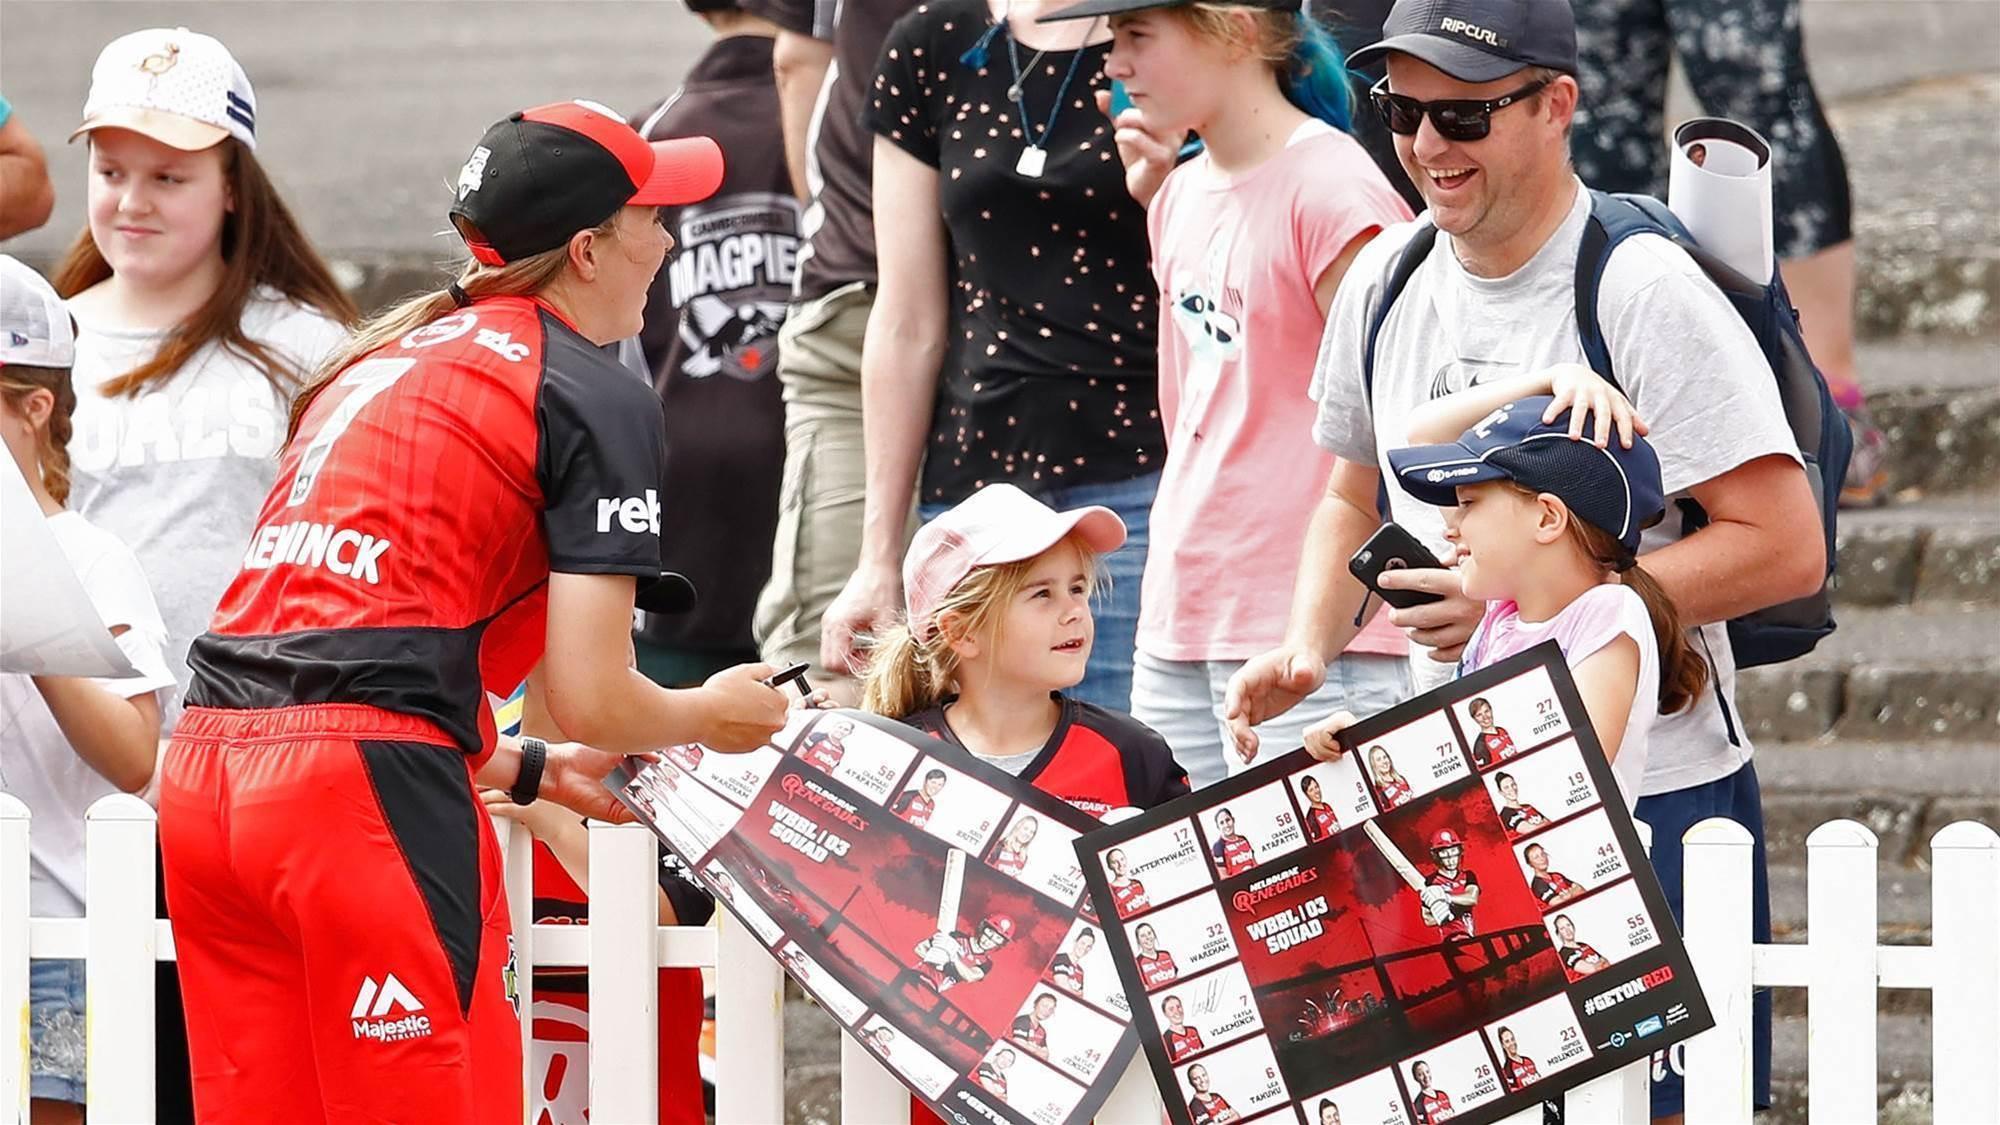 Vlaeminck leads Australia's U19 to first series win